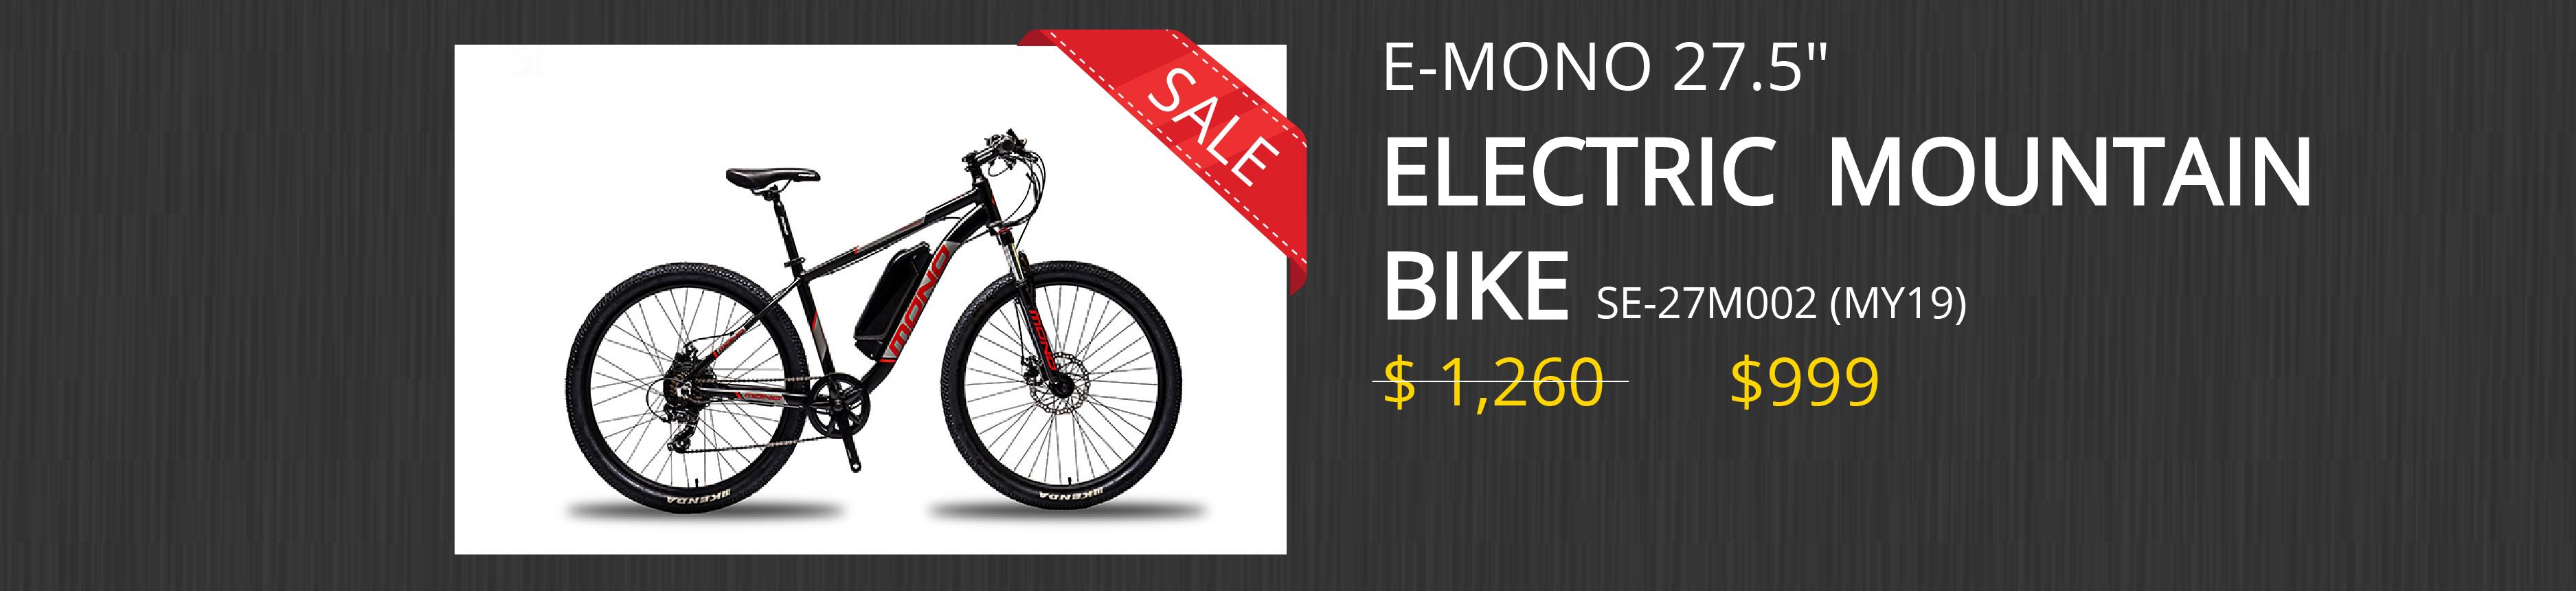 EMONO-Mountain-Bike-27M002-banner